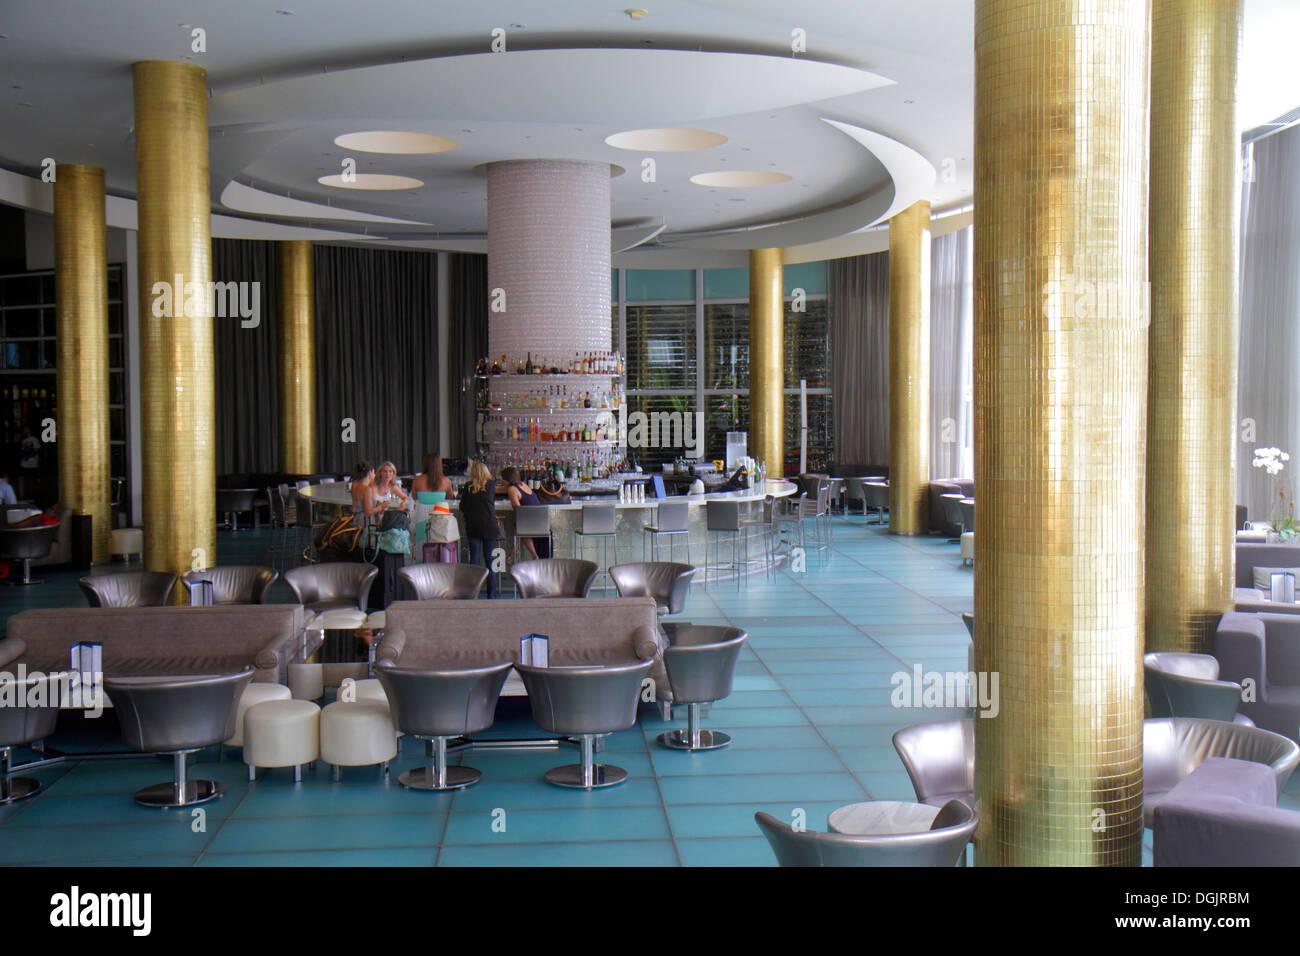 Miami Beach Florida Collins Avenue Fontainebleau Miami Beach hotel inside interior lobby bar Stock Photo